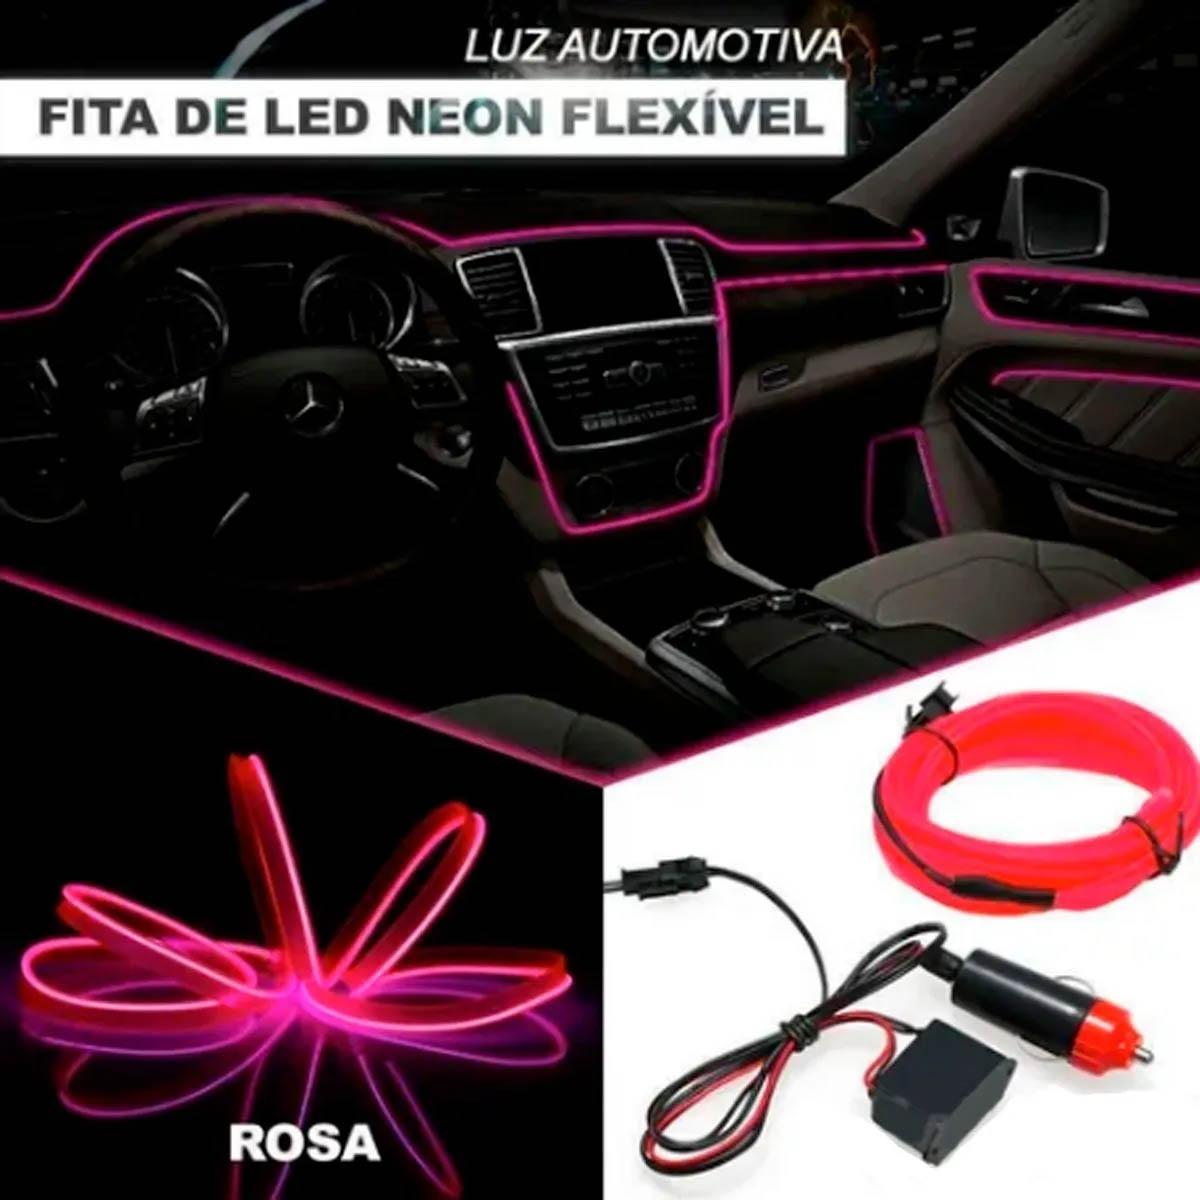 Fita Led Rosa 5 Metros Painel Inteiro De Carro Neon